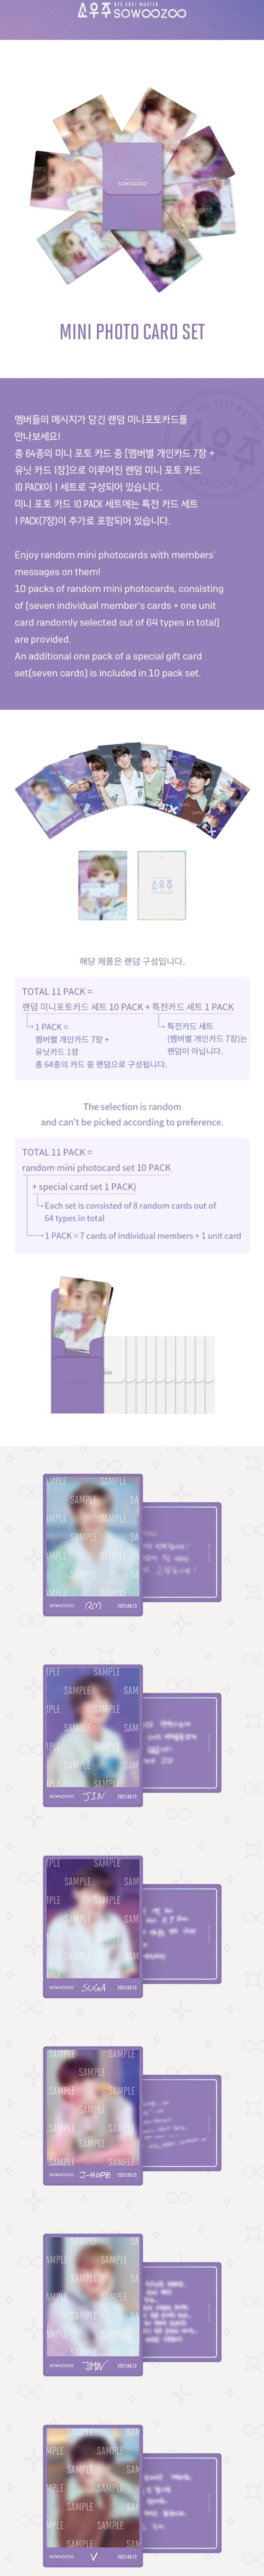 BTS SoWooZoo Mini Photo Card Set